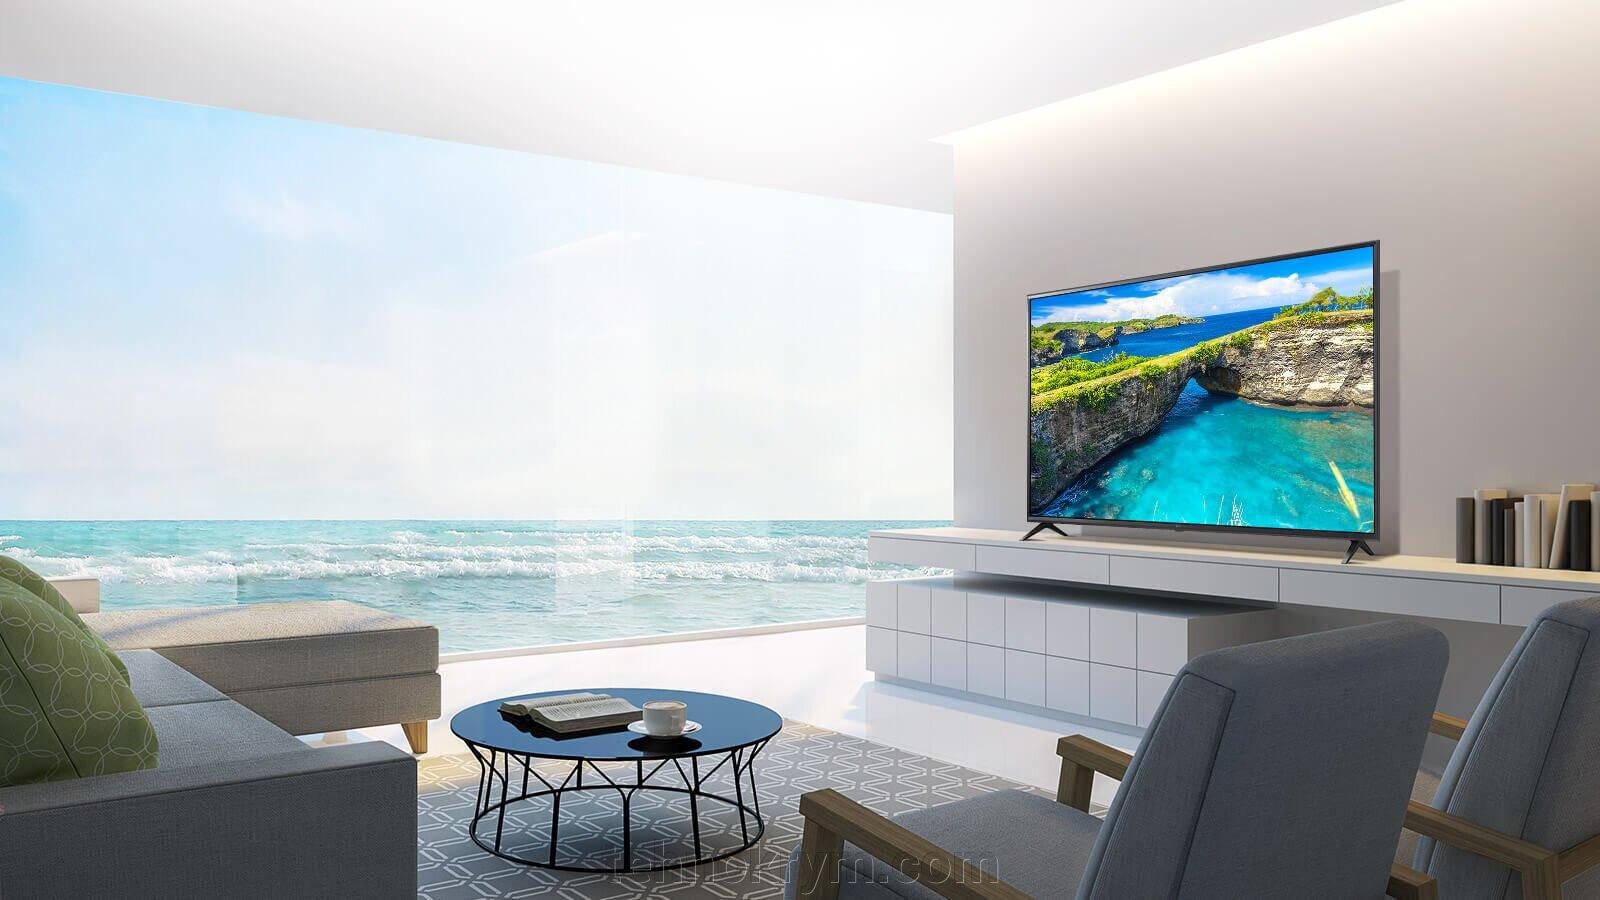 Smart телевизор LG 49UK6200PLA, Ultra HD 4K, WebOS 4.0, модельный ряд 2018 года - фото LG 49UK6200PLA